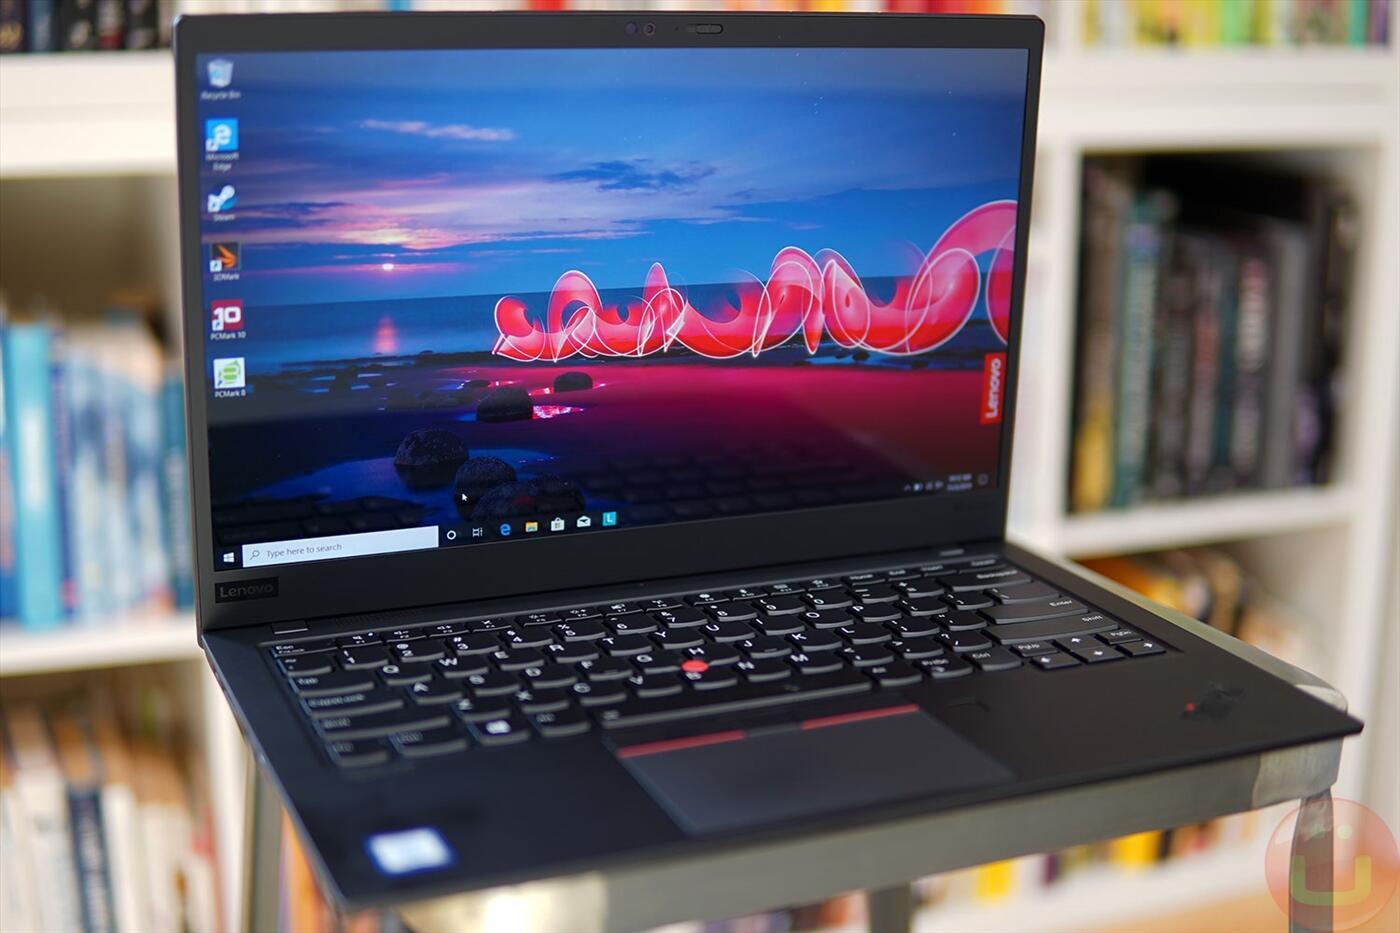 Lenovo ThinkPad X1 Carbon Gen 8 FHD - Quad Core i7 10510U / RAM 16GB / 256GB/ FULL HD New